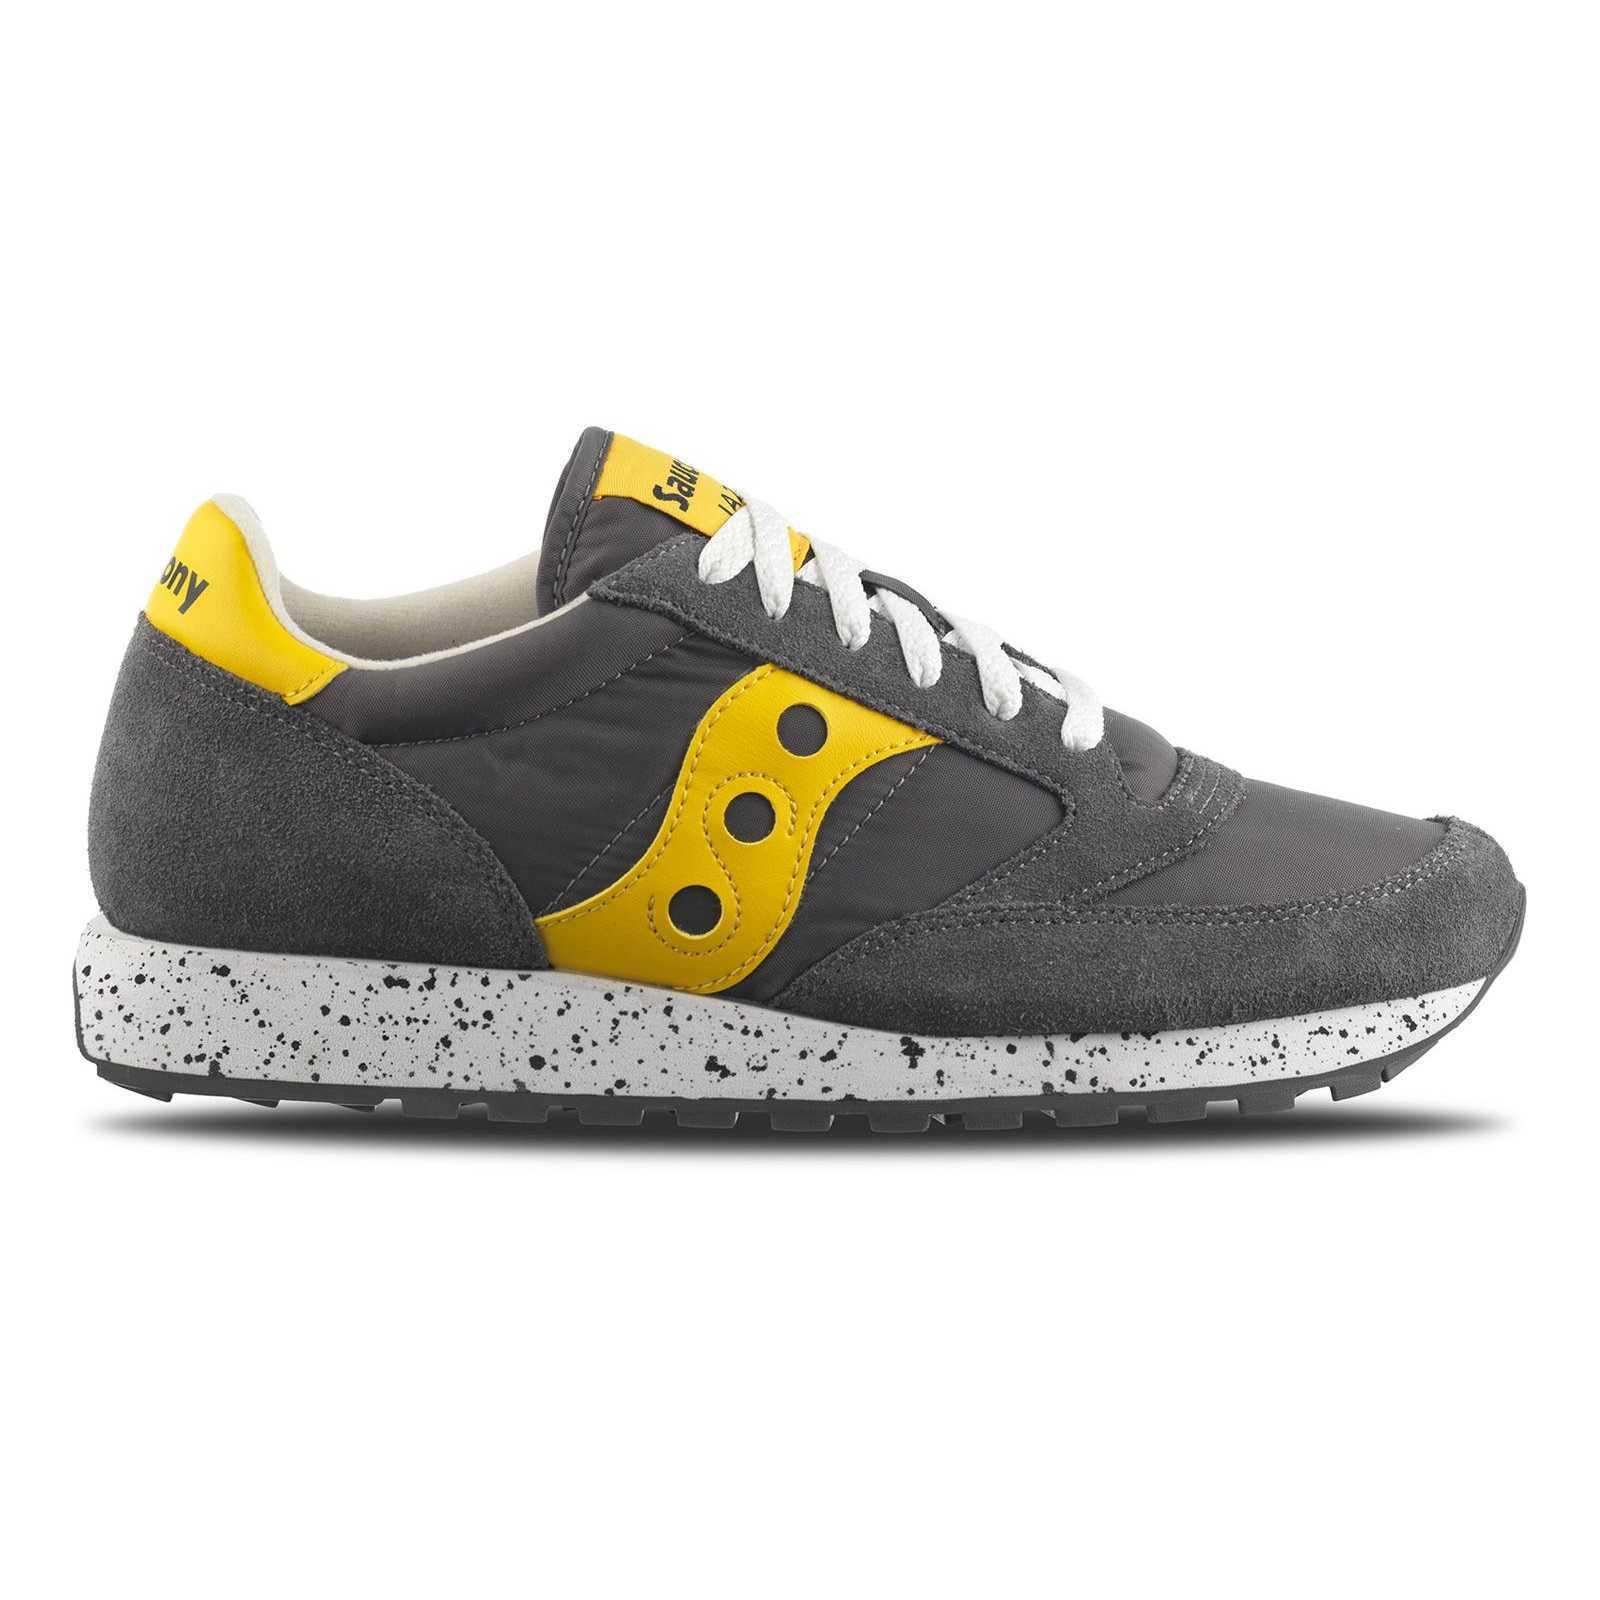 Saucony Jazz Original Man Grey 2044-417 Sneakers shoes Splashed